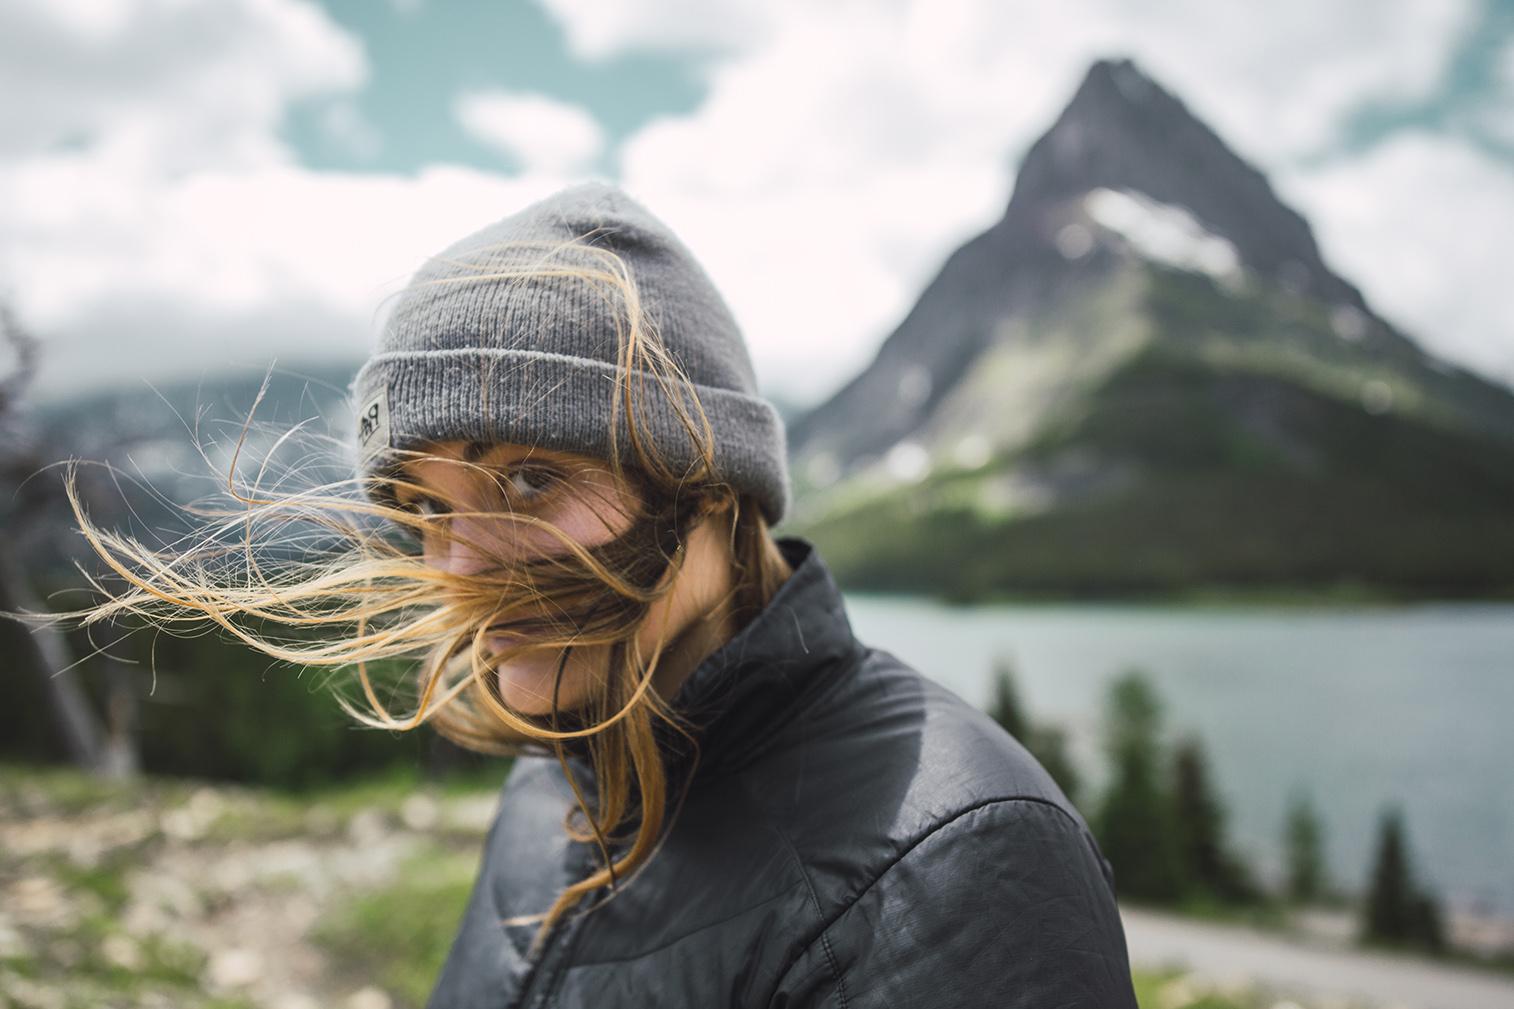 sarah-hirning-glacier-national-park-wind-hair-in-face.jpg